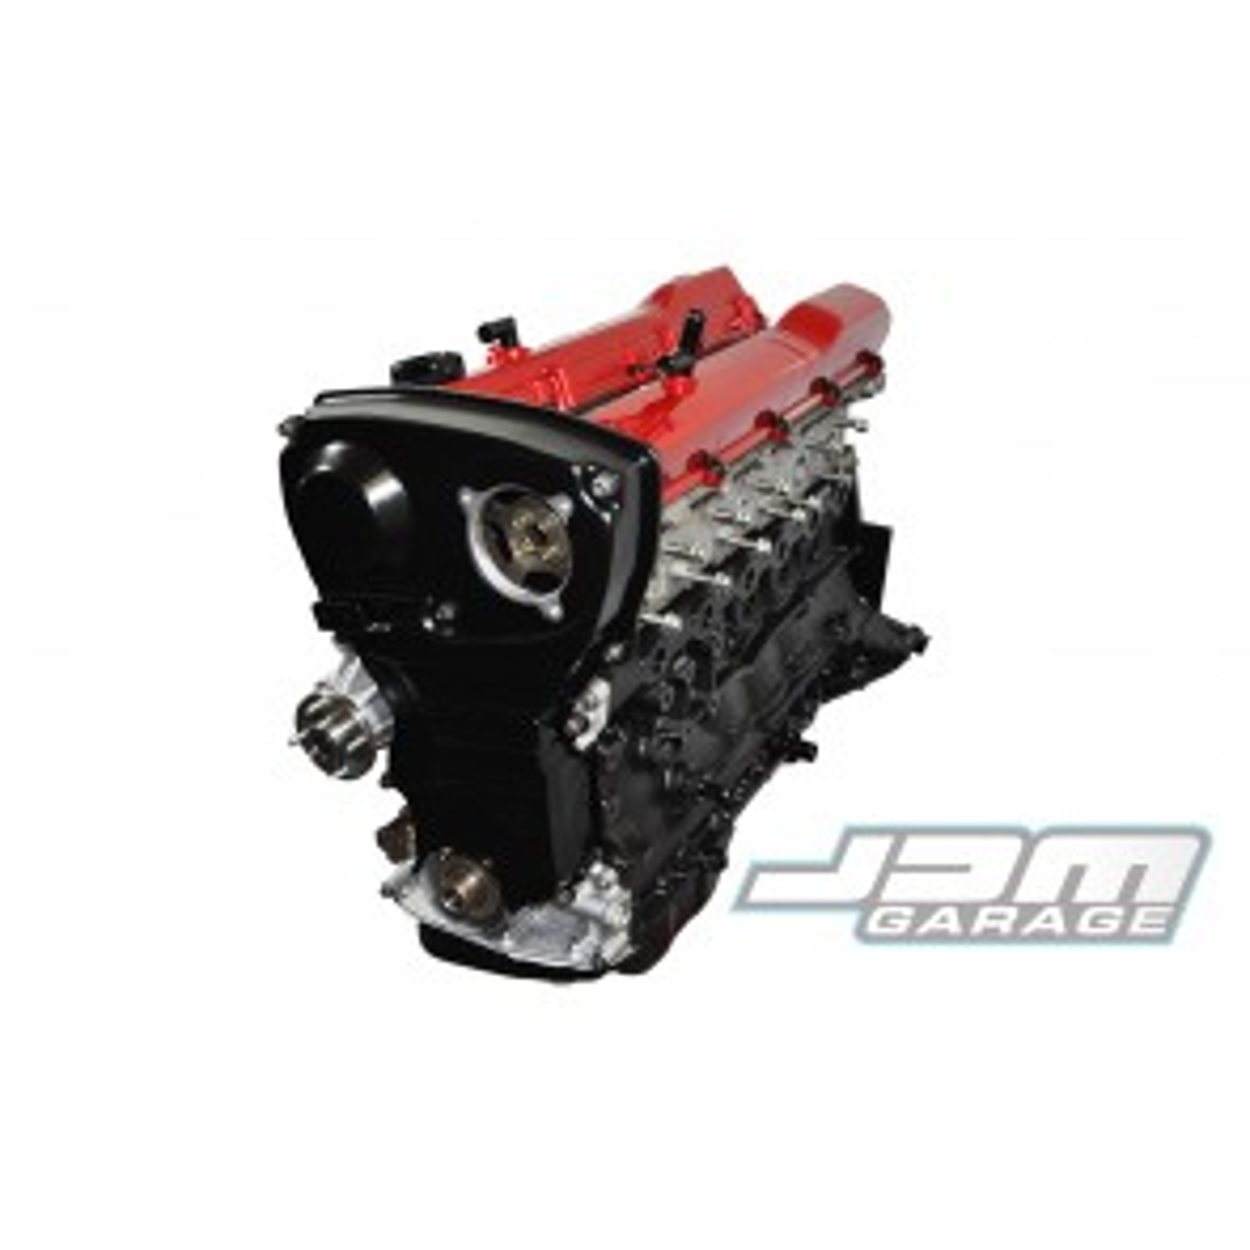 Nissan RB25DET Refreshed Forged Engine R33 GTST